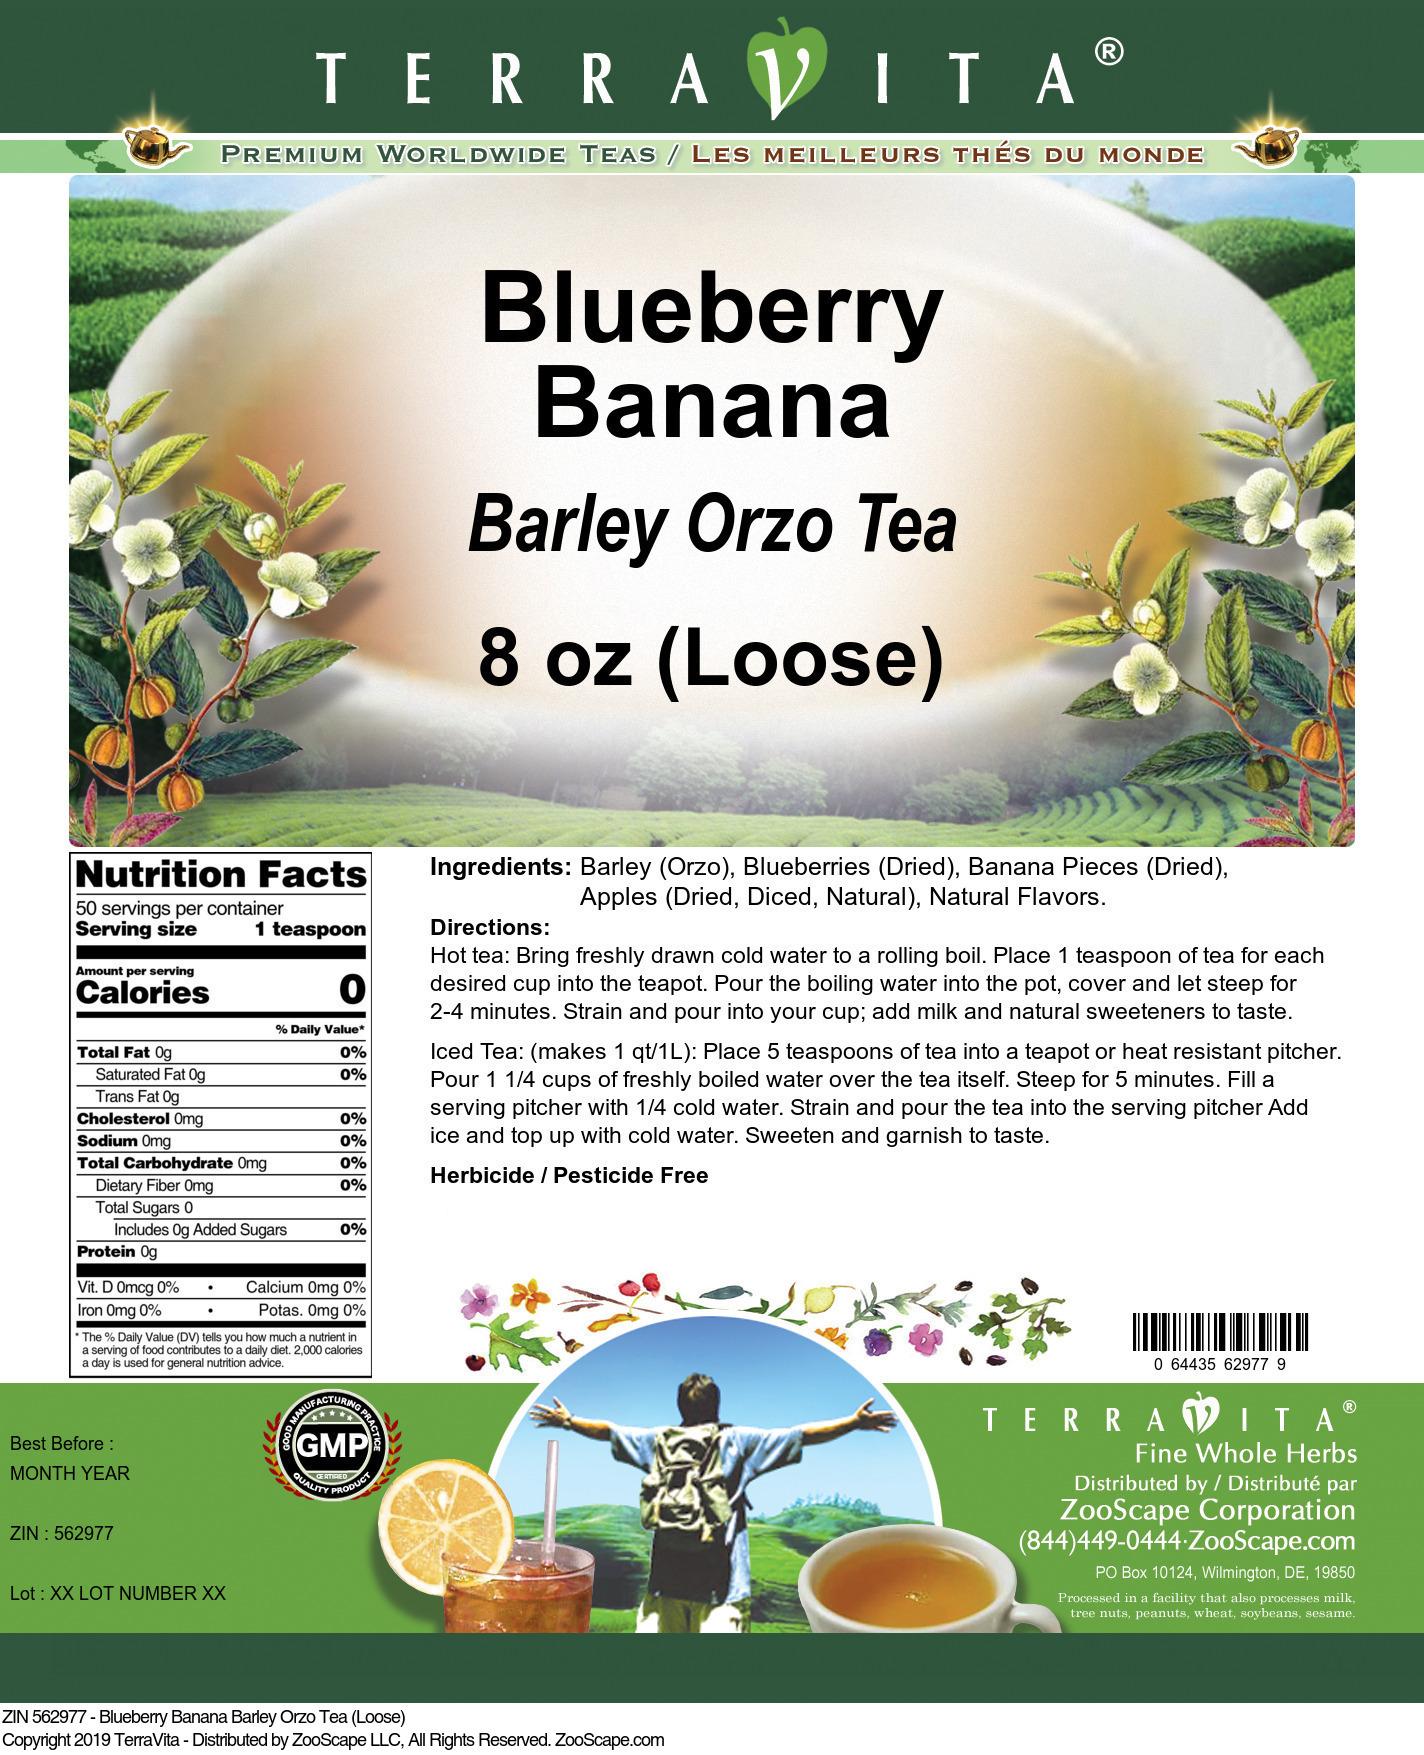 Blueberry Banana Barley Orzo